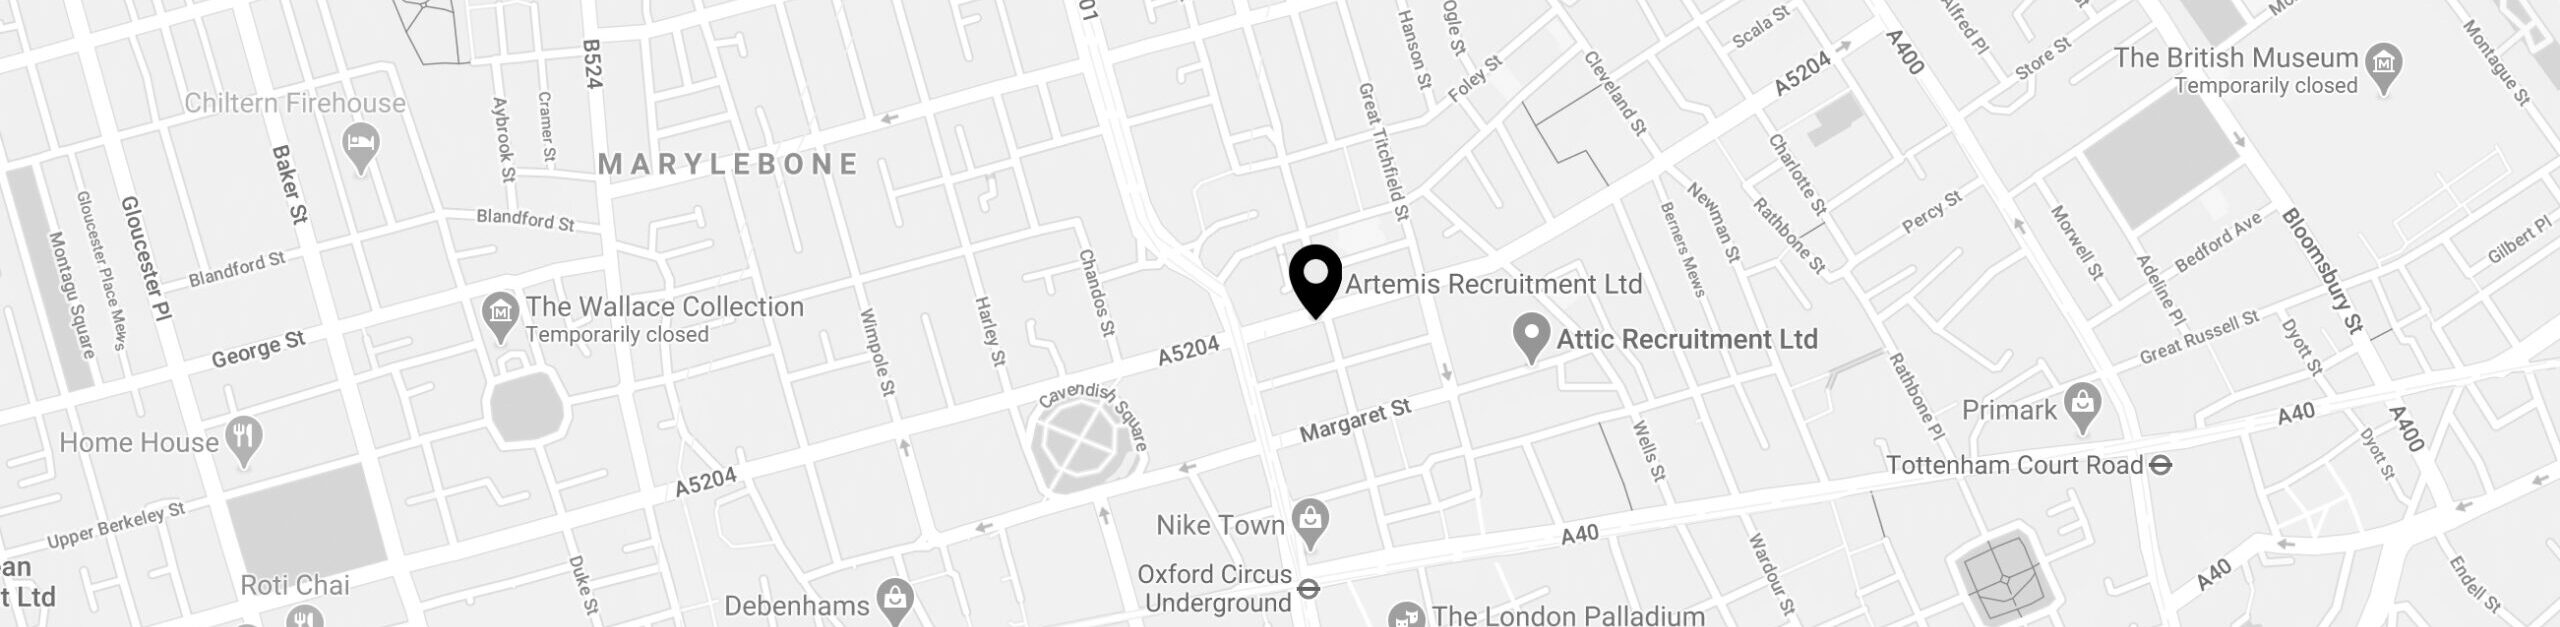 Artemis Recruitment On The Map